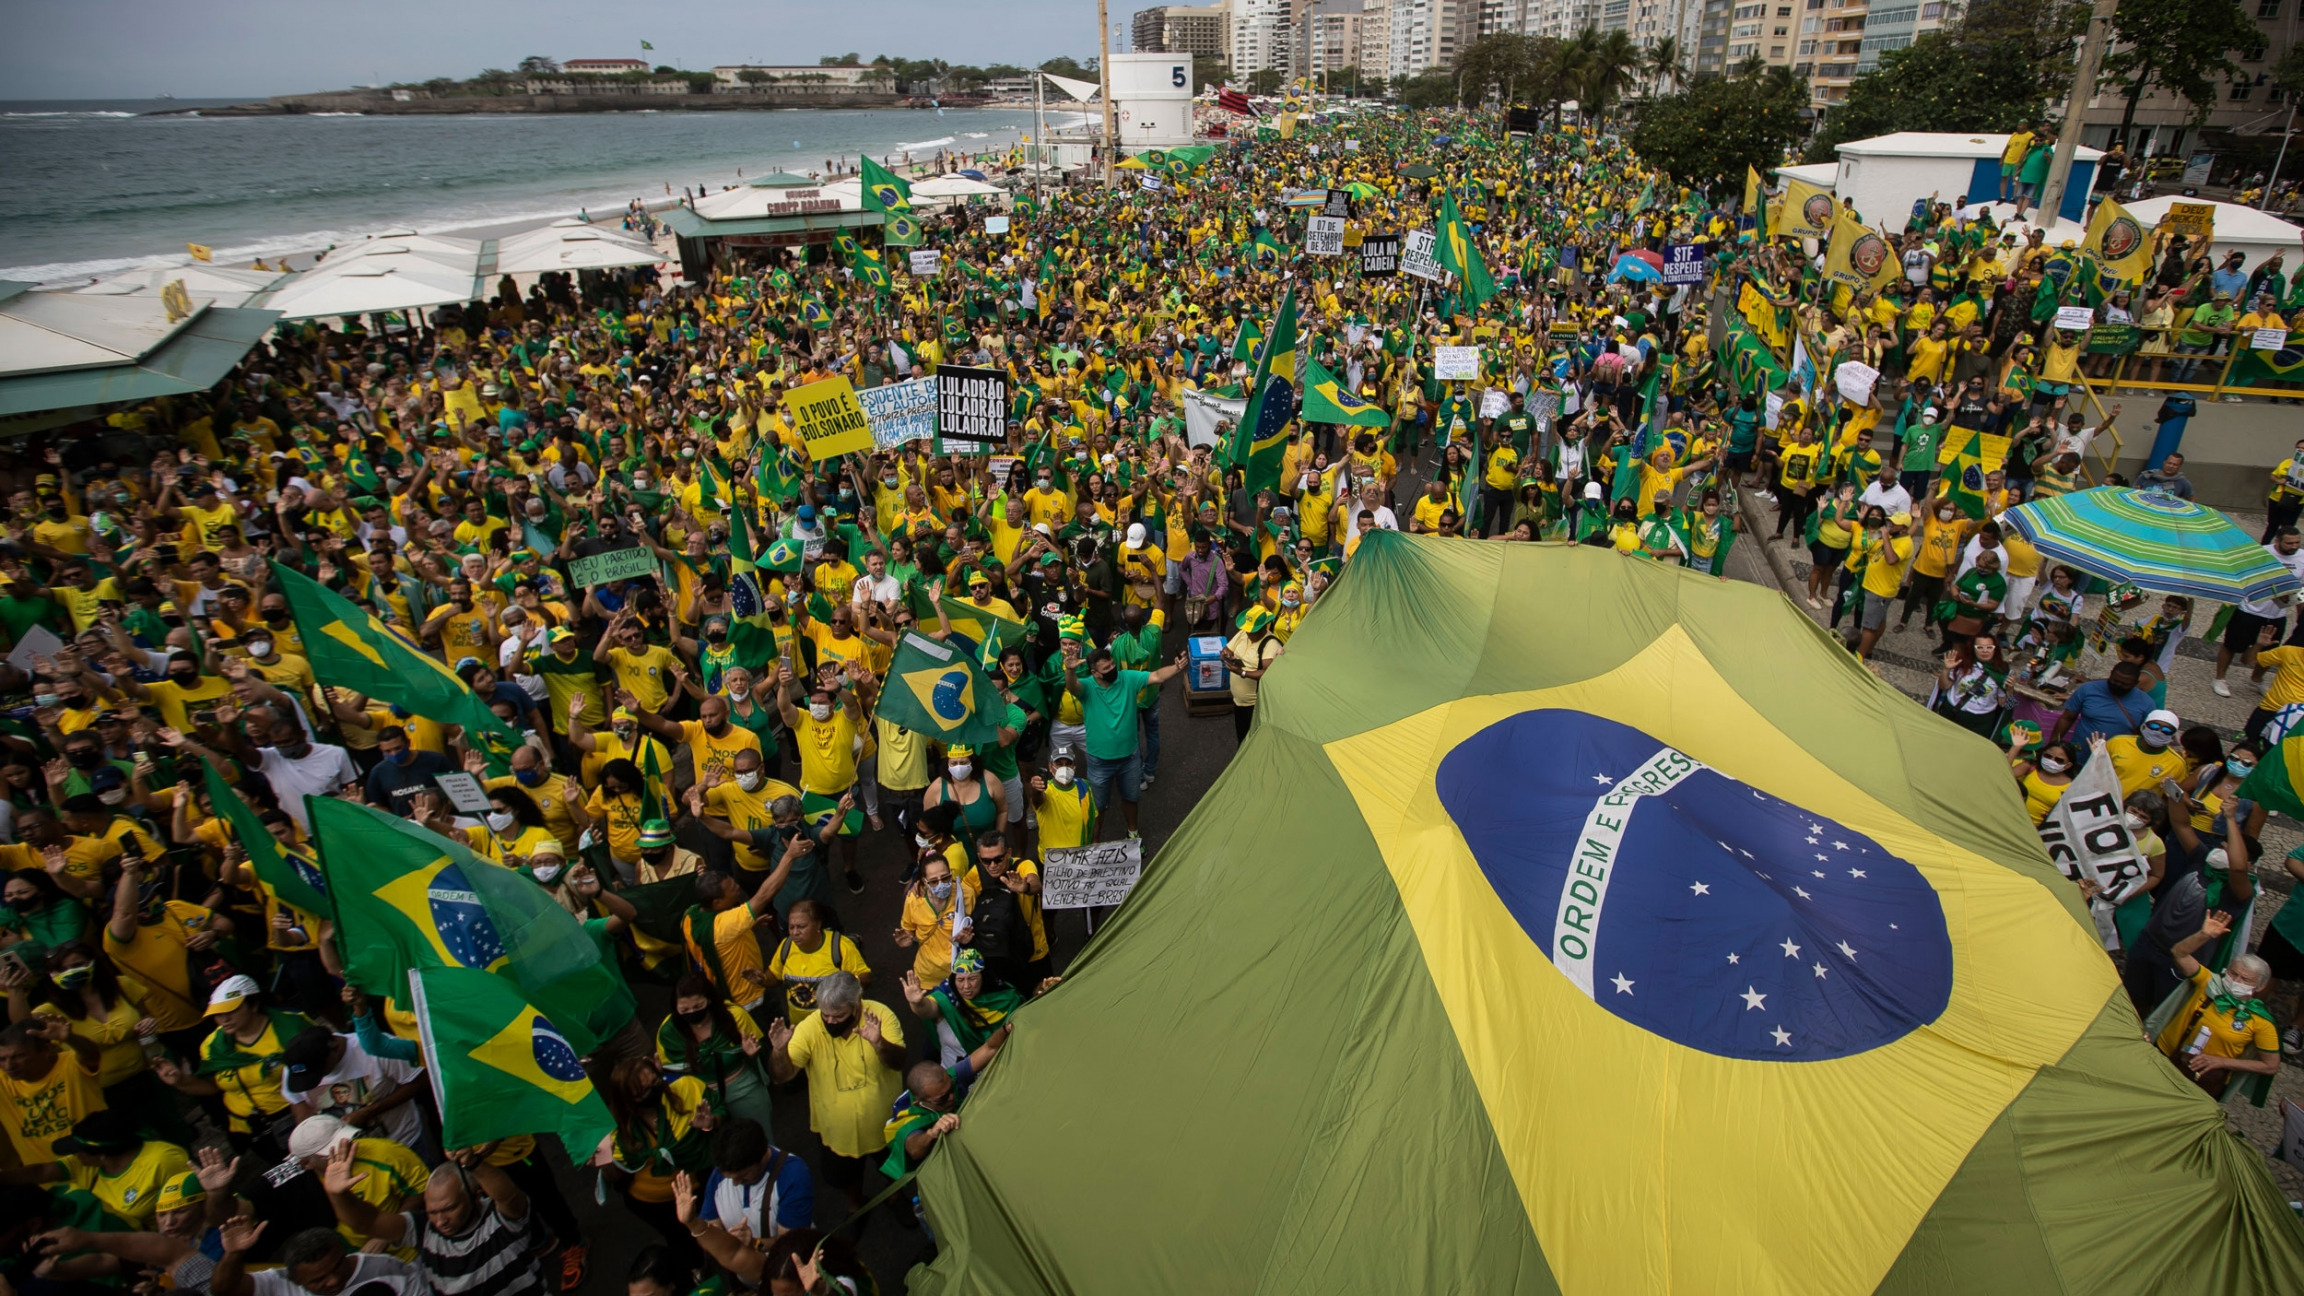 Supporters of Brazilian President Jair Bolsonaro carry Brazil's national flag along Copacabana Beach on Independence Day in Rio de Janeiro, Brazil, Tuesday, Sept. 7, 2021.